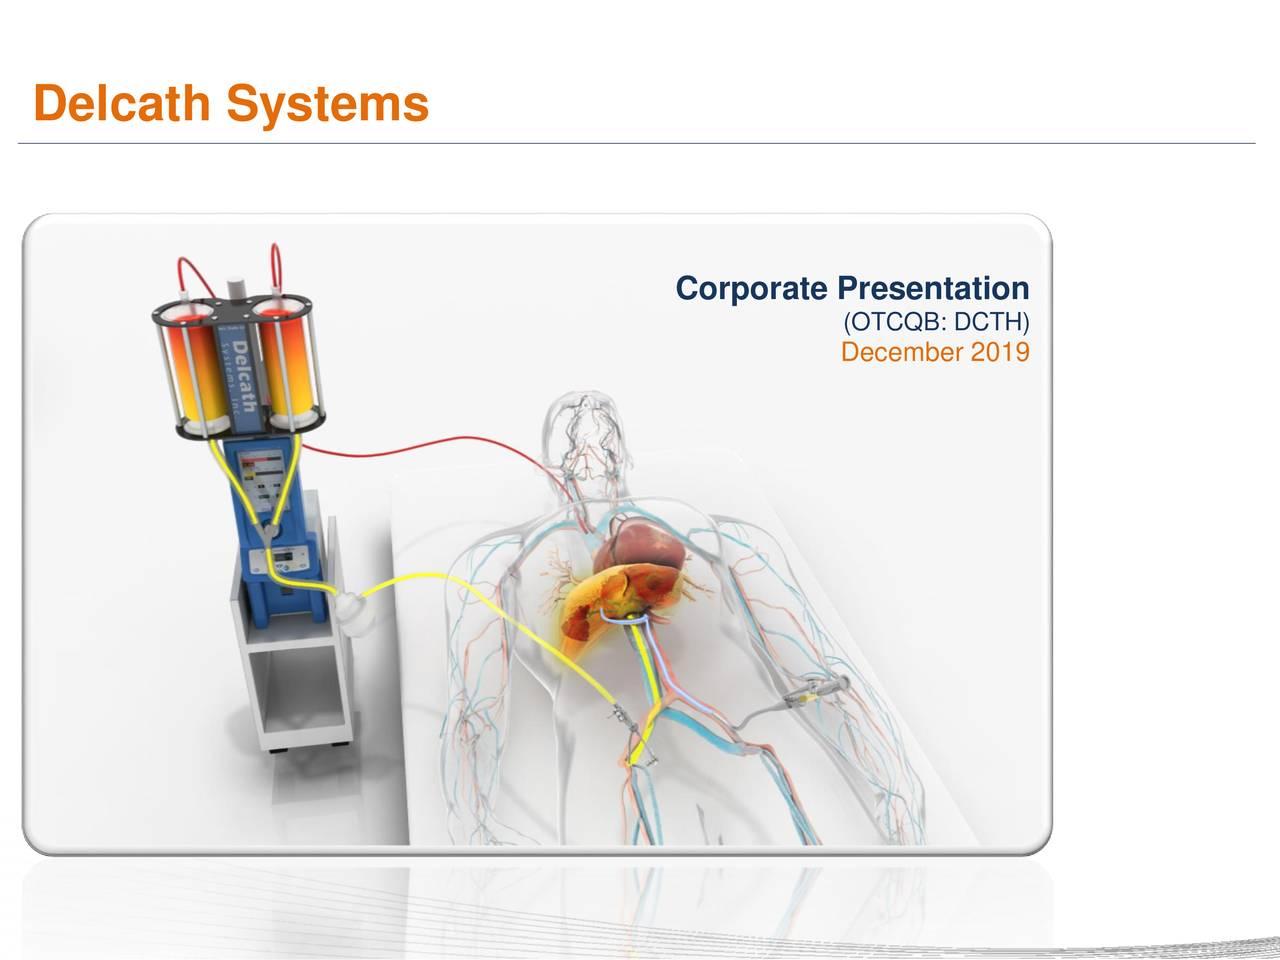 Delcath Systems (DCTH) Investor Presentation - Slideshow - Delcath Systems, Inc. (OTCMKTS:DCTH) | Seeking Alpha